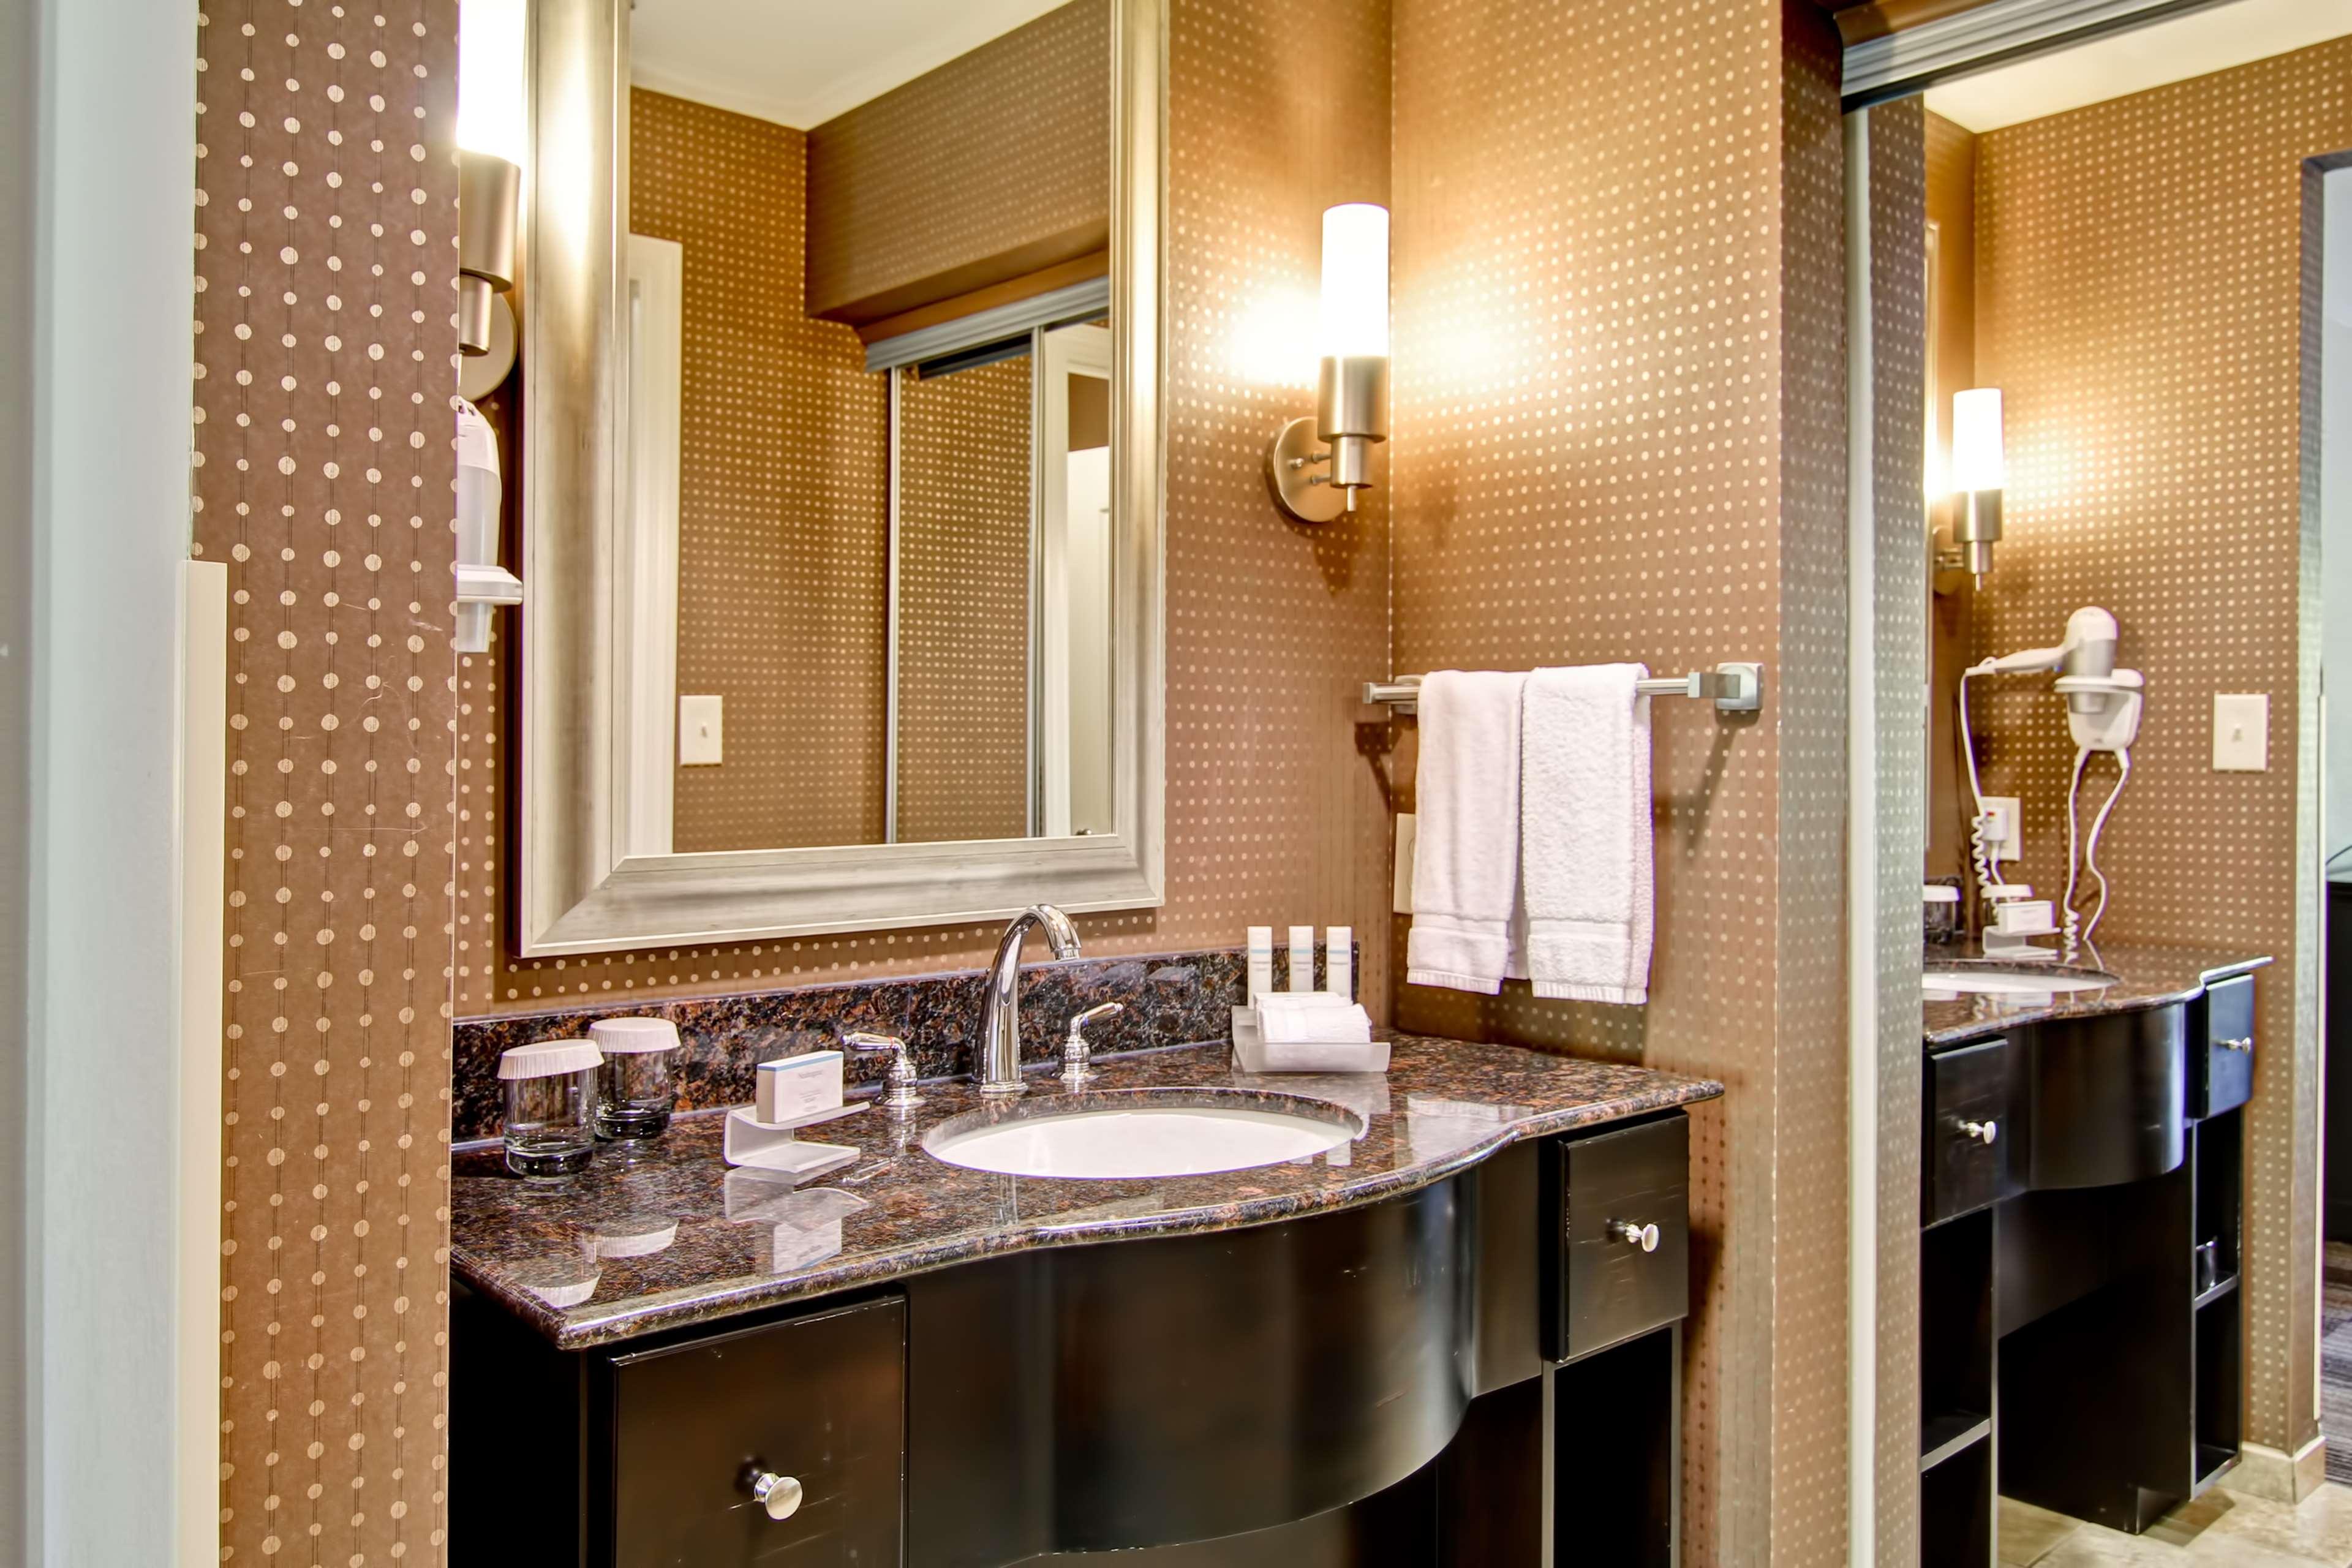 Homewood Suites by Hilton Cincinnati Airport South-Florence image 17